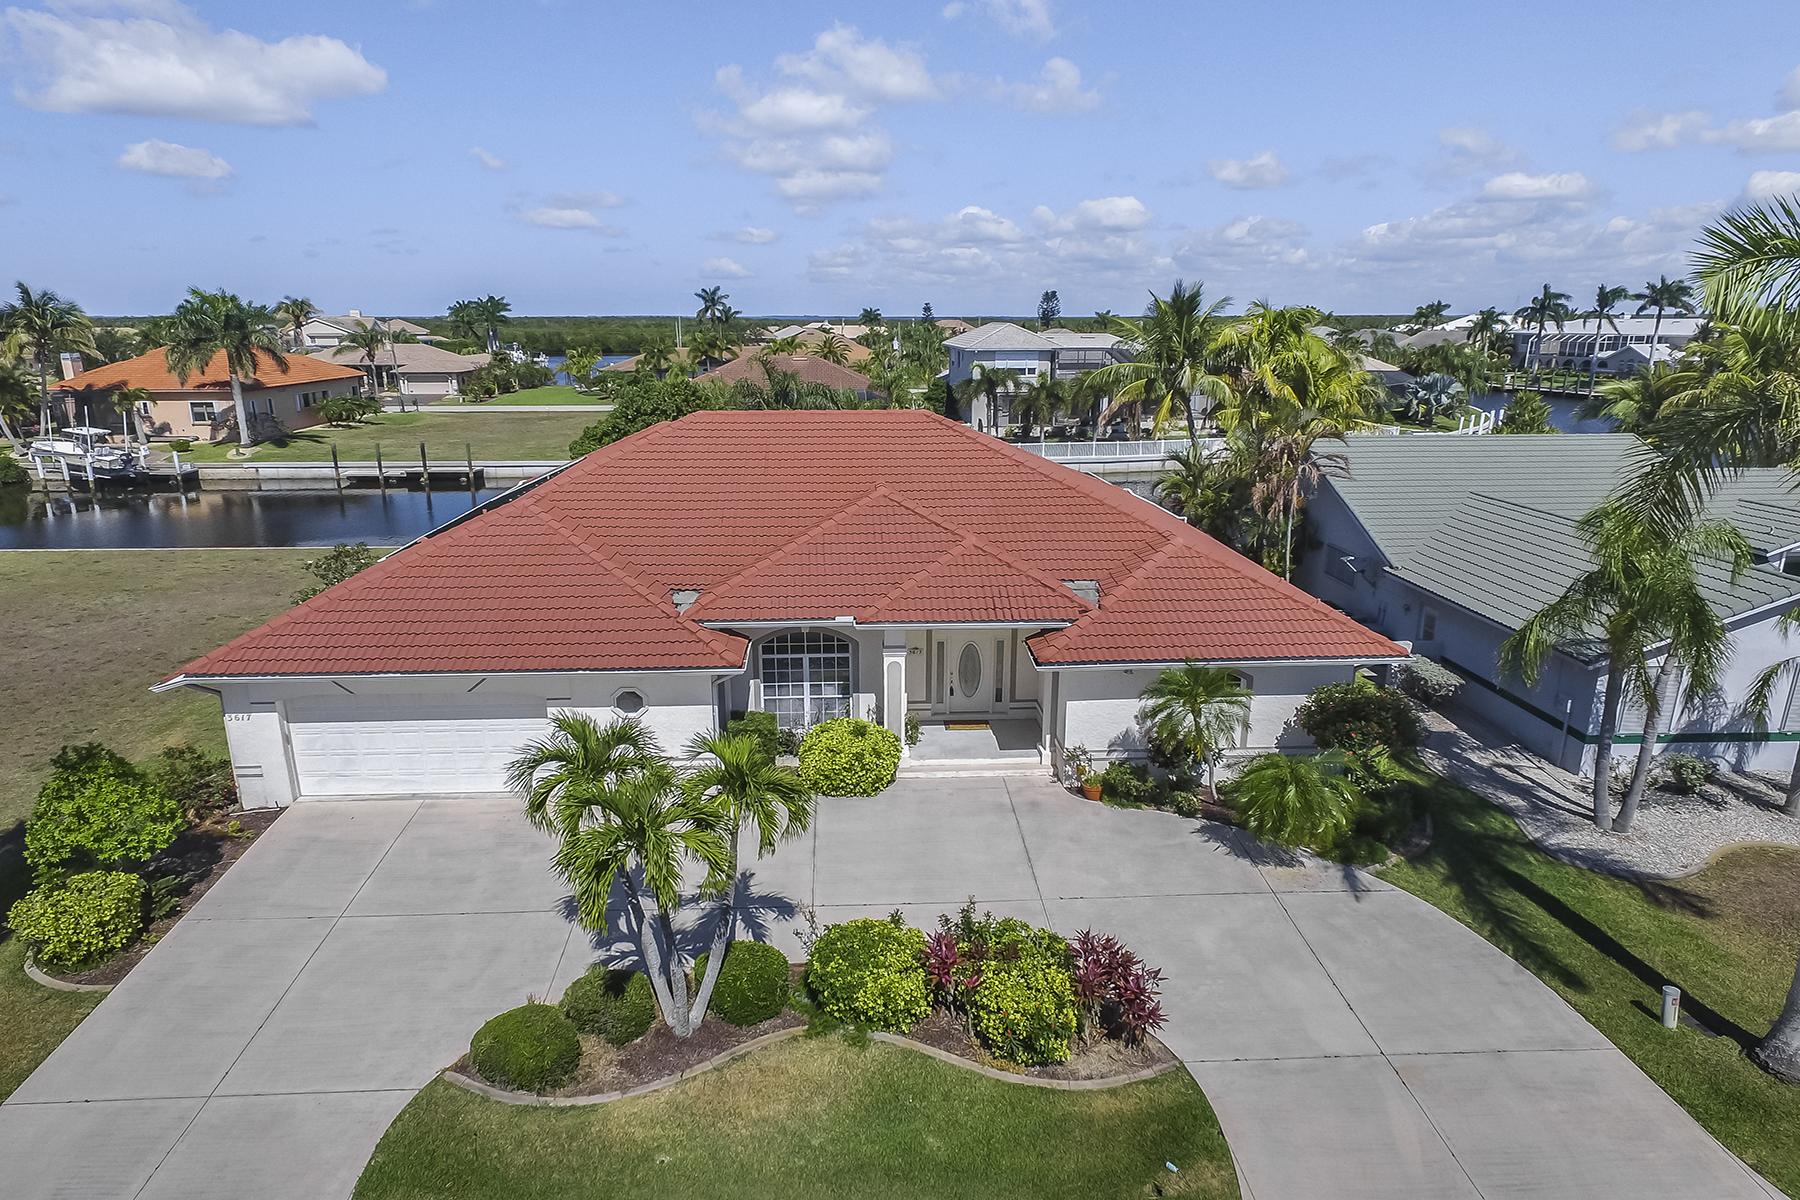 Single Family Home for Sale at PUNTA GORDA ISLES 3617 Bonaire Ct Punta Gorda, Florida 33950 United States